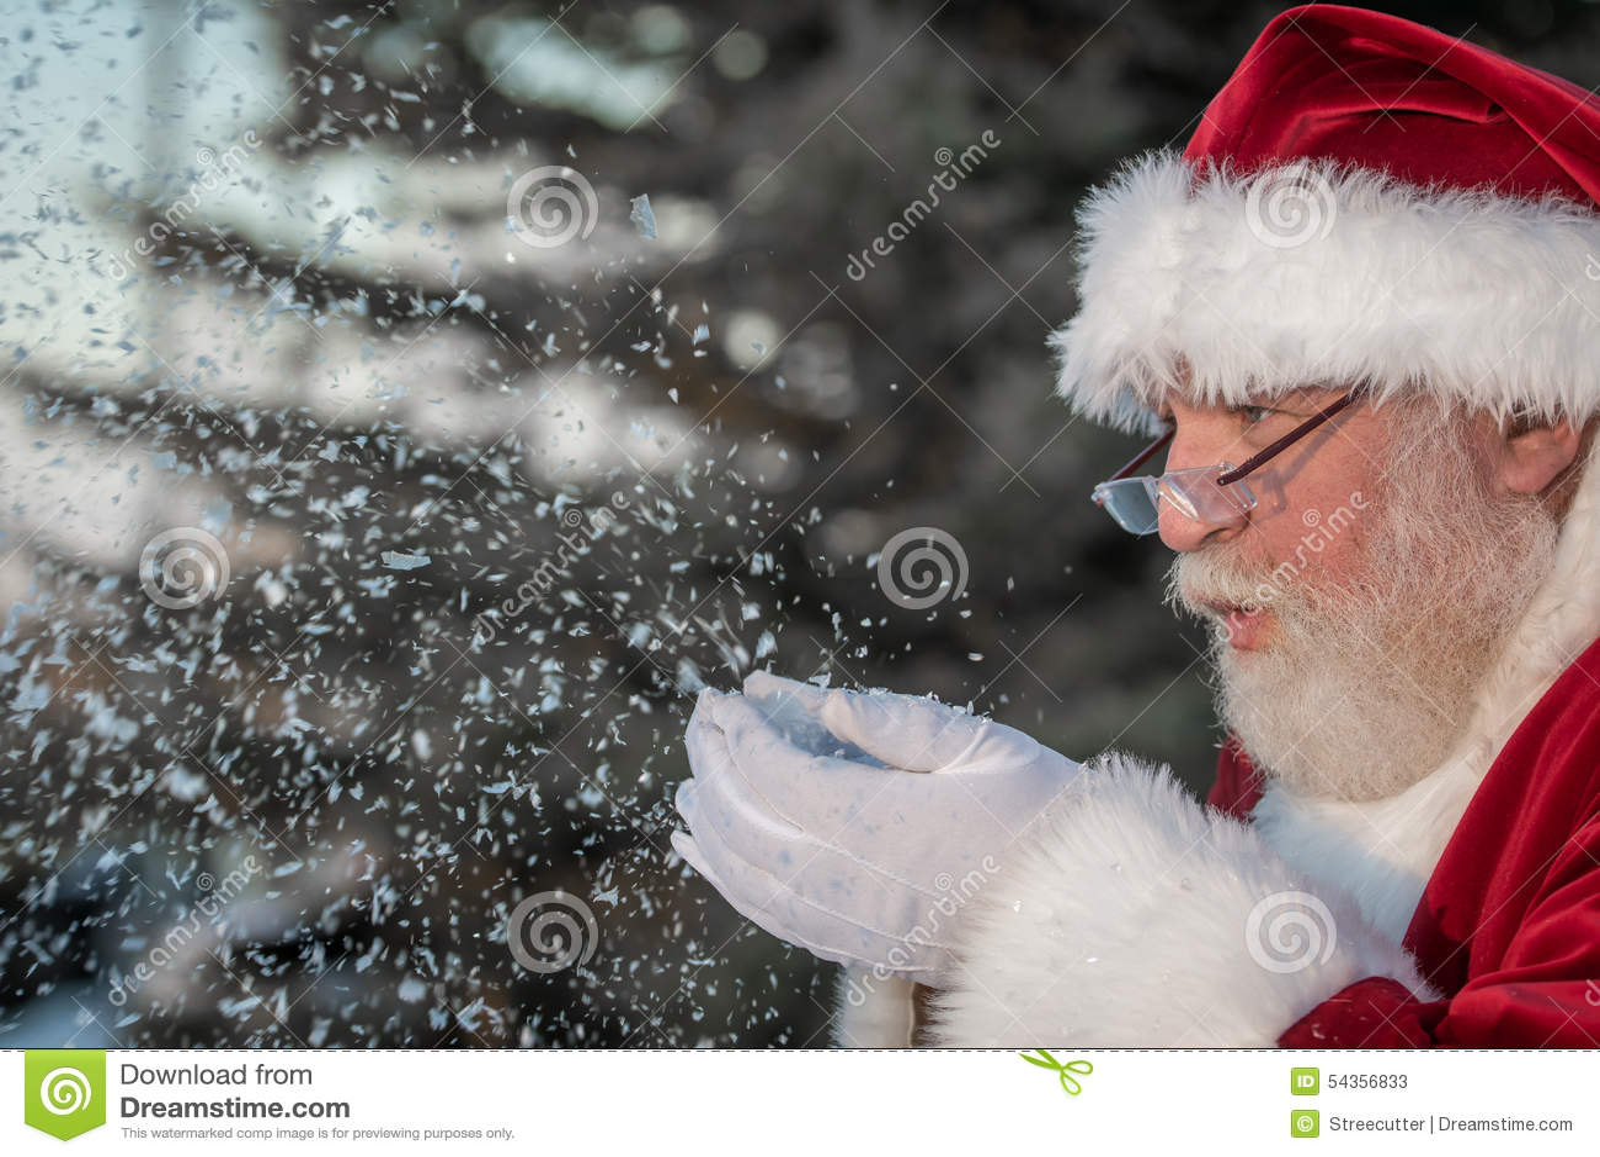 Santa Clause Blowing Snow Stock Photo Image 54356833